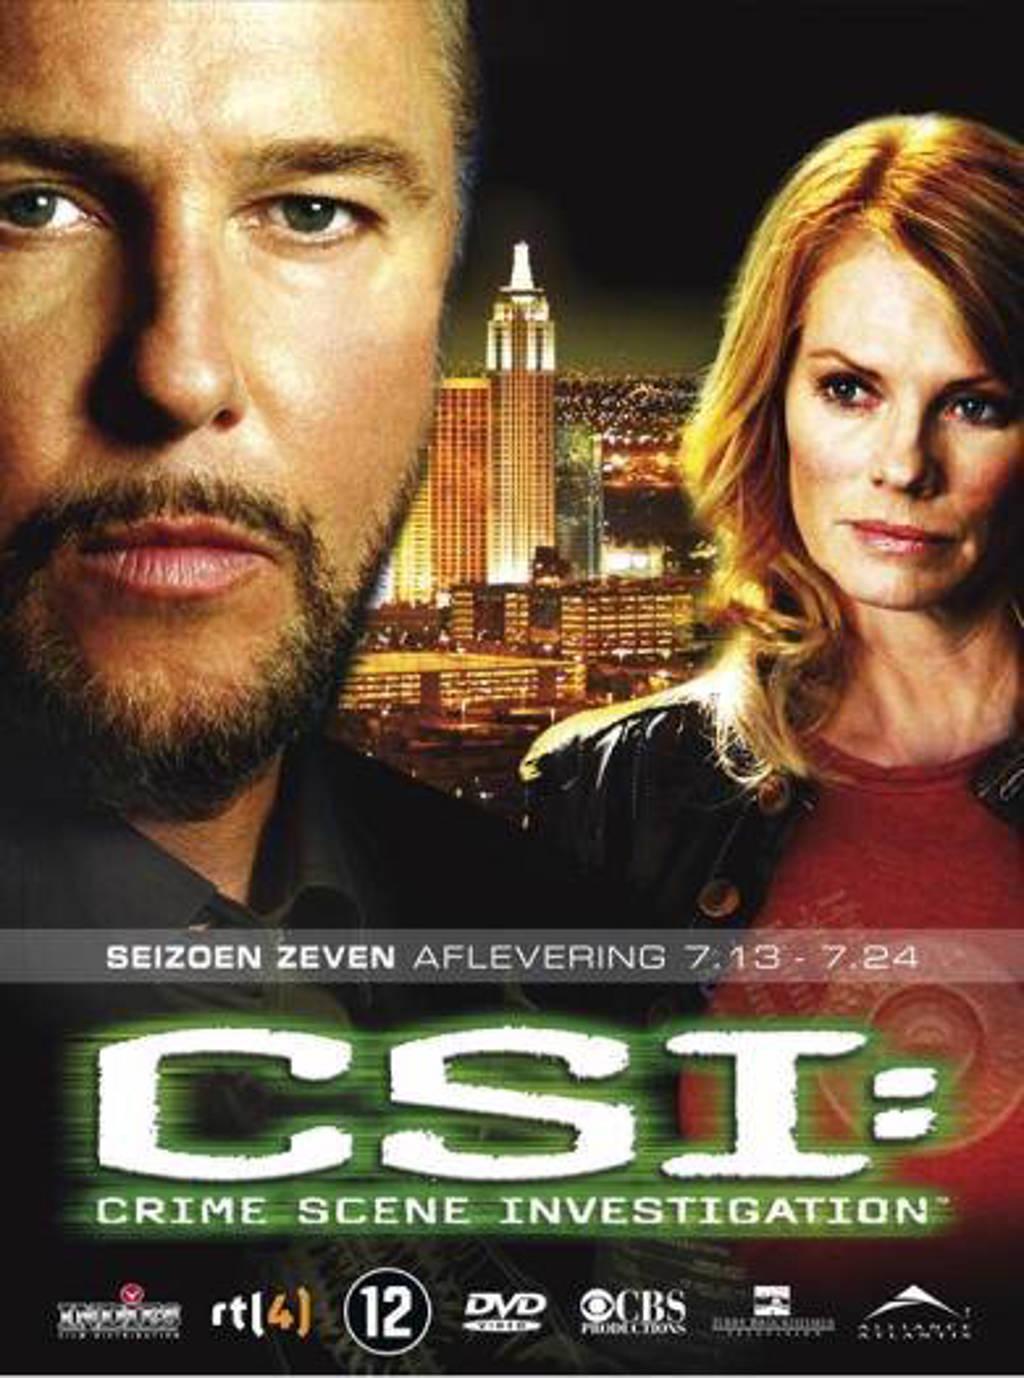 CSI - Seizoen 7 deel 2 (DVD)